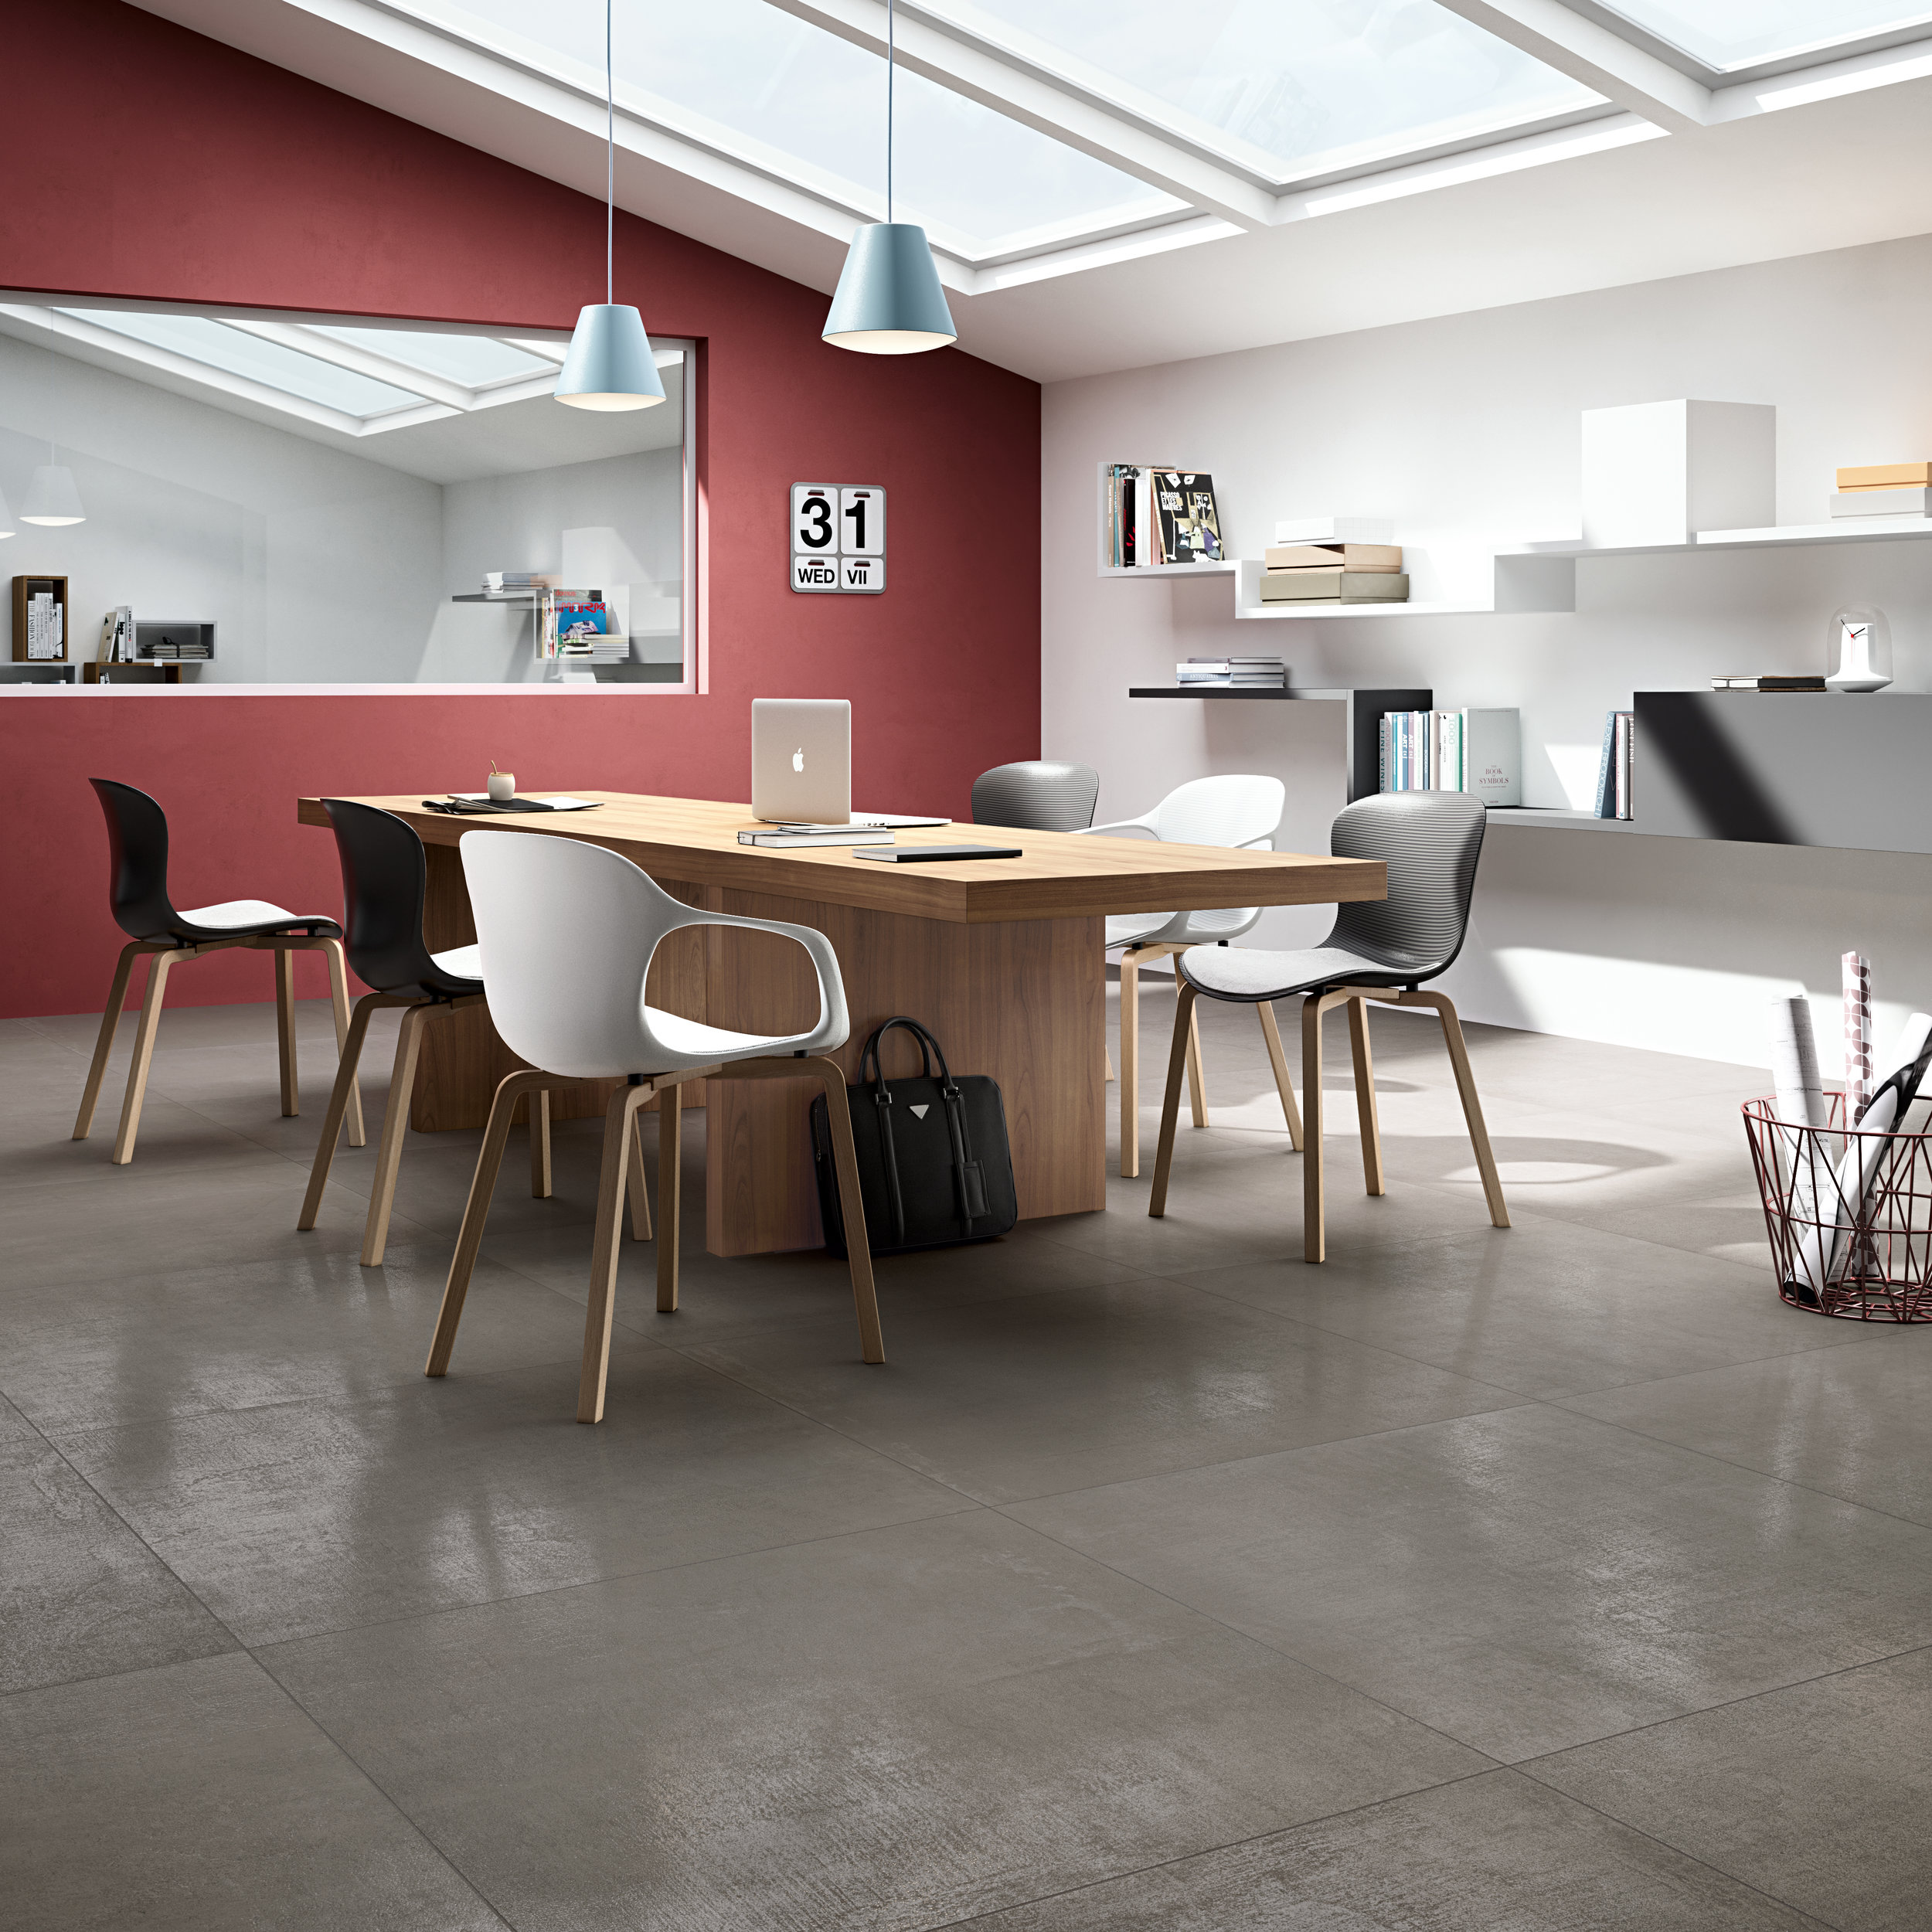 BLU-concretejungle-store18-honed-11mm-office-001.jpg